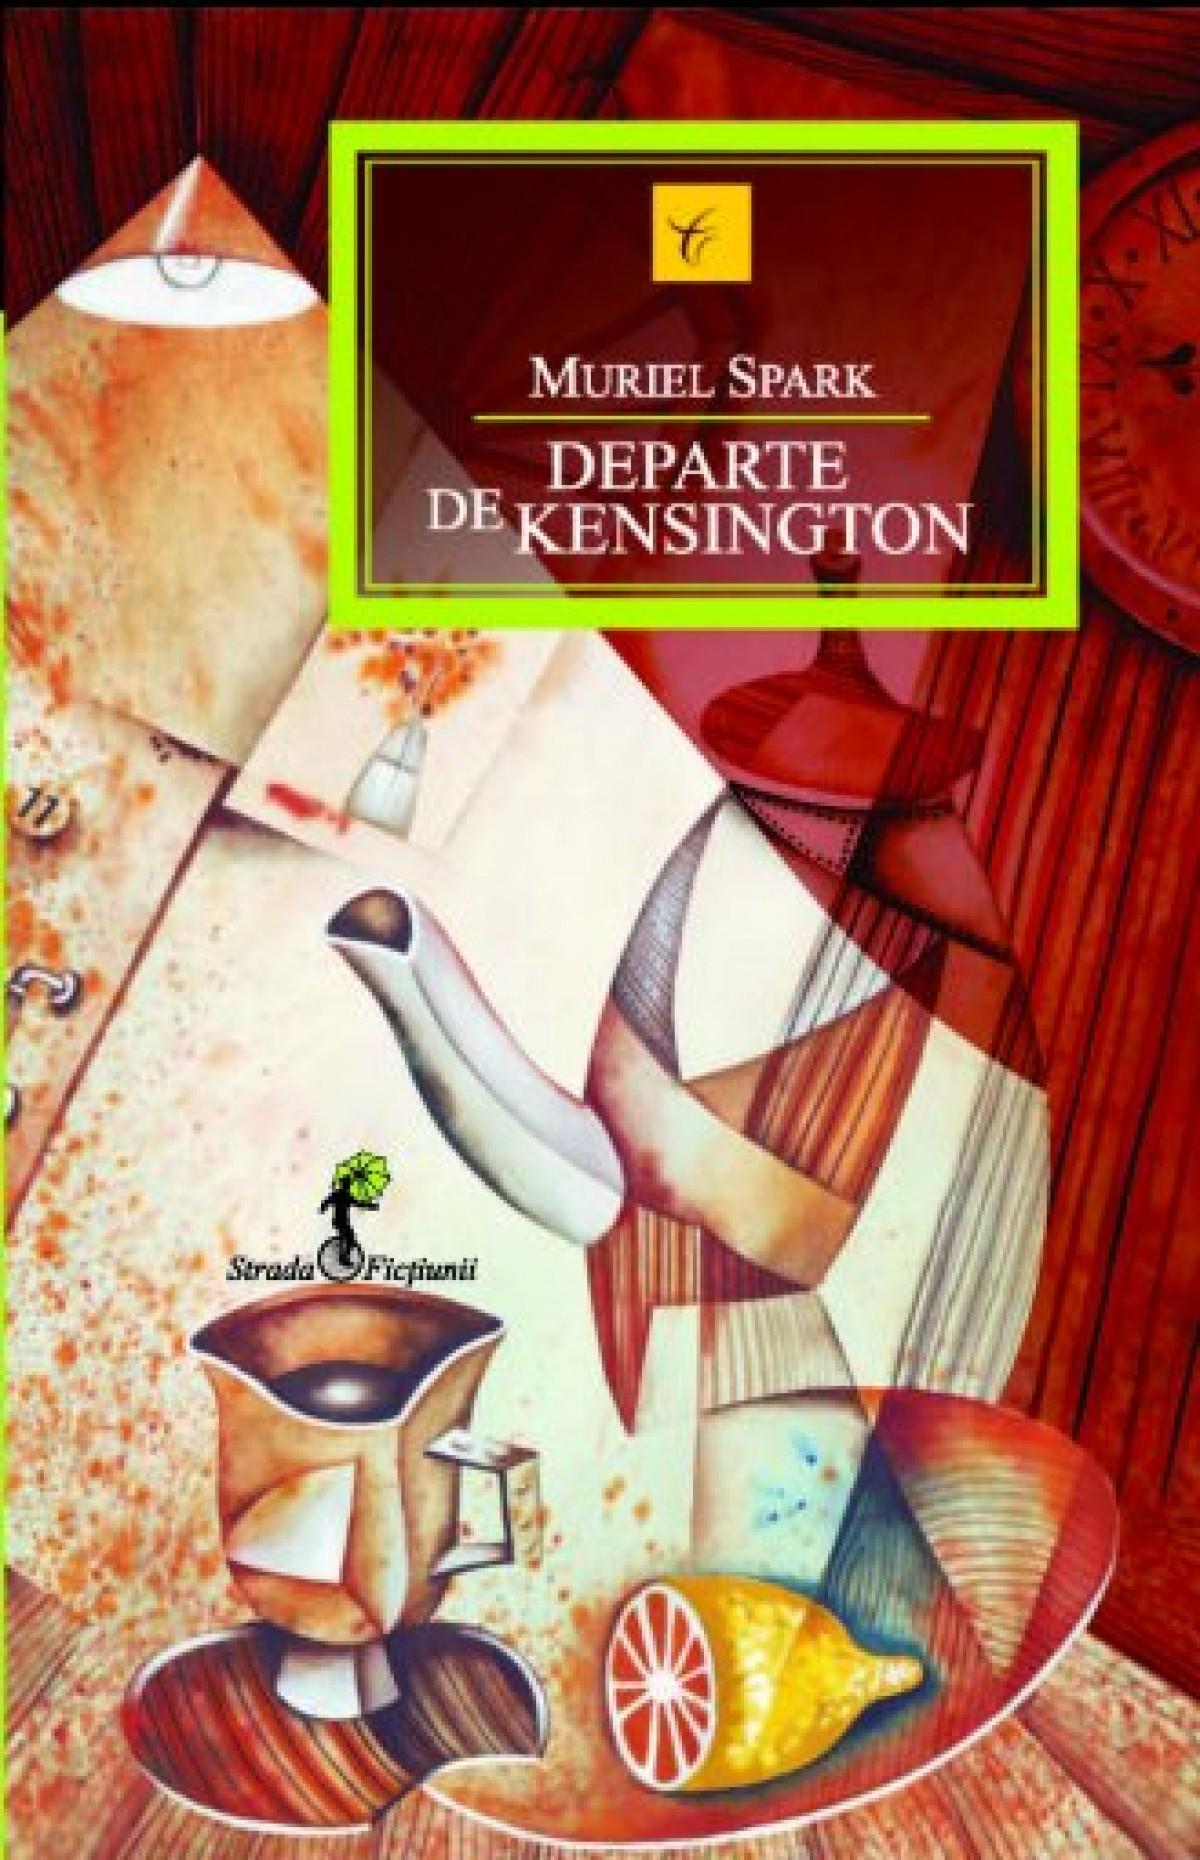 Departe de Kensington